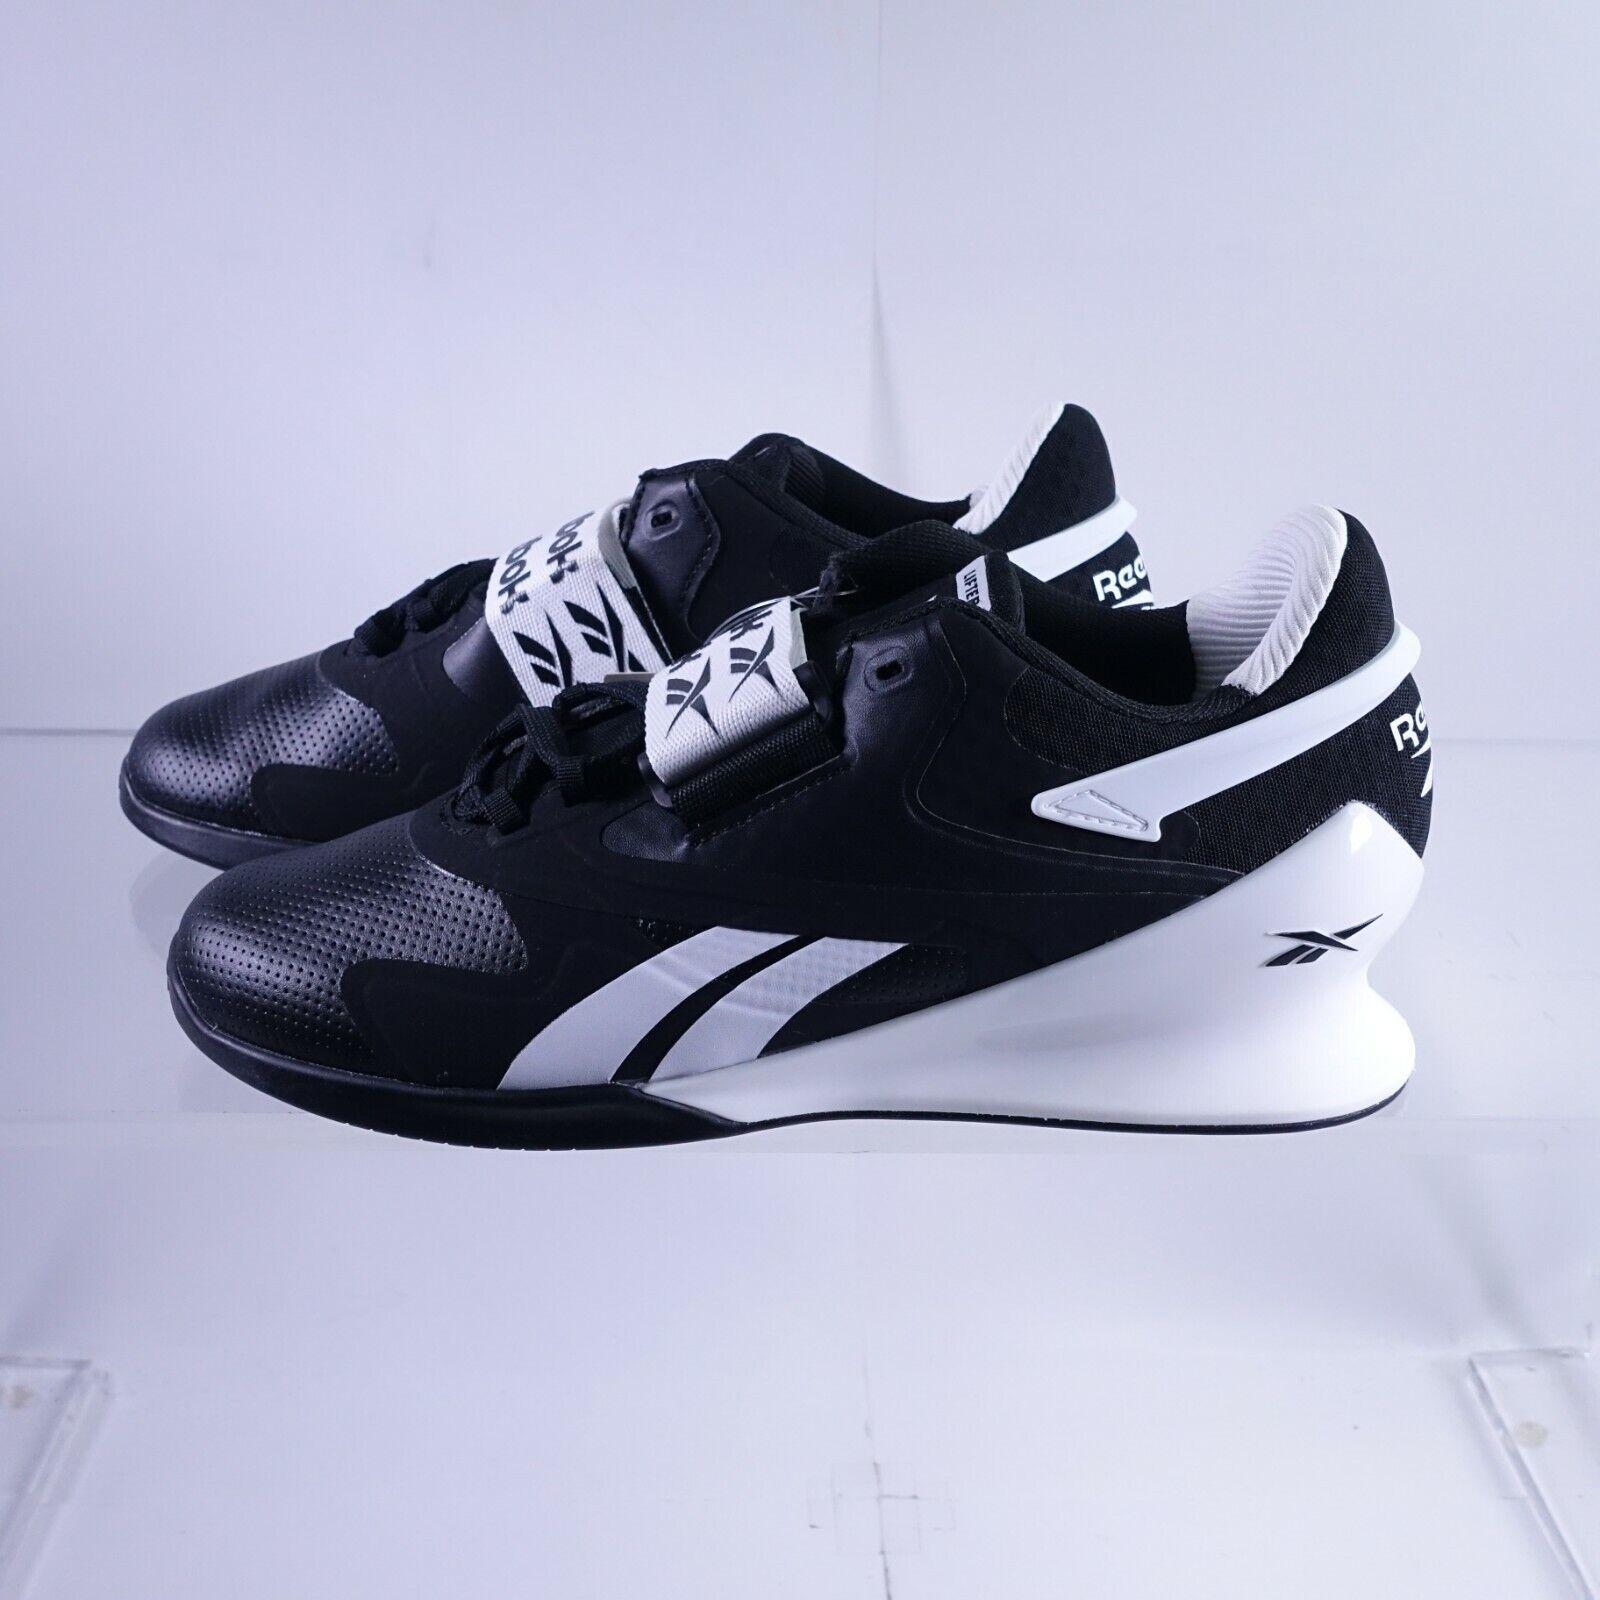 Taille 9.5 femme Reebok Héritage Lifter II Haltérophilie Chaussures FV0529 Noir/Blanc